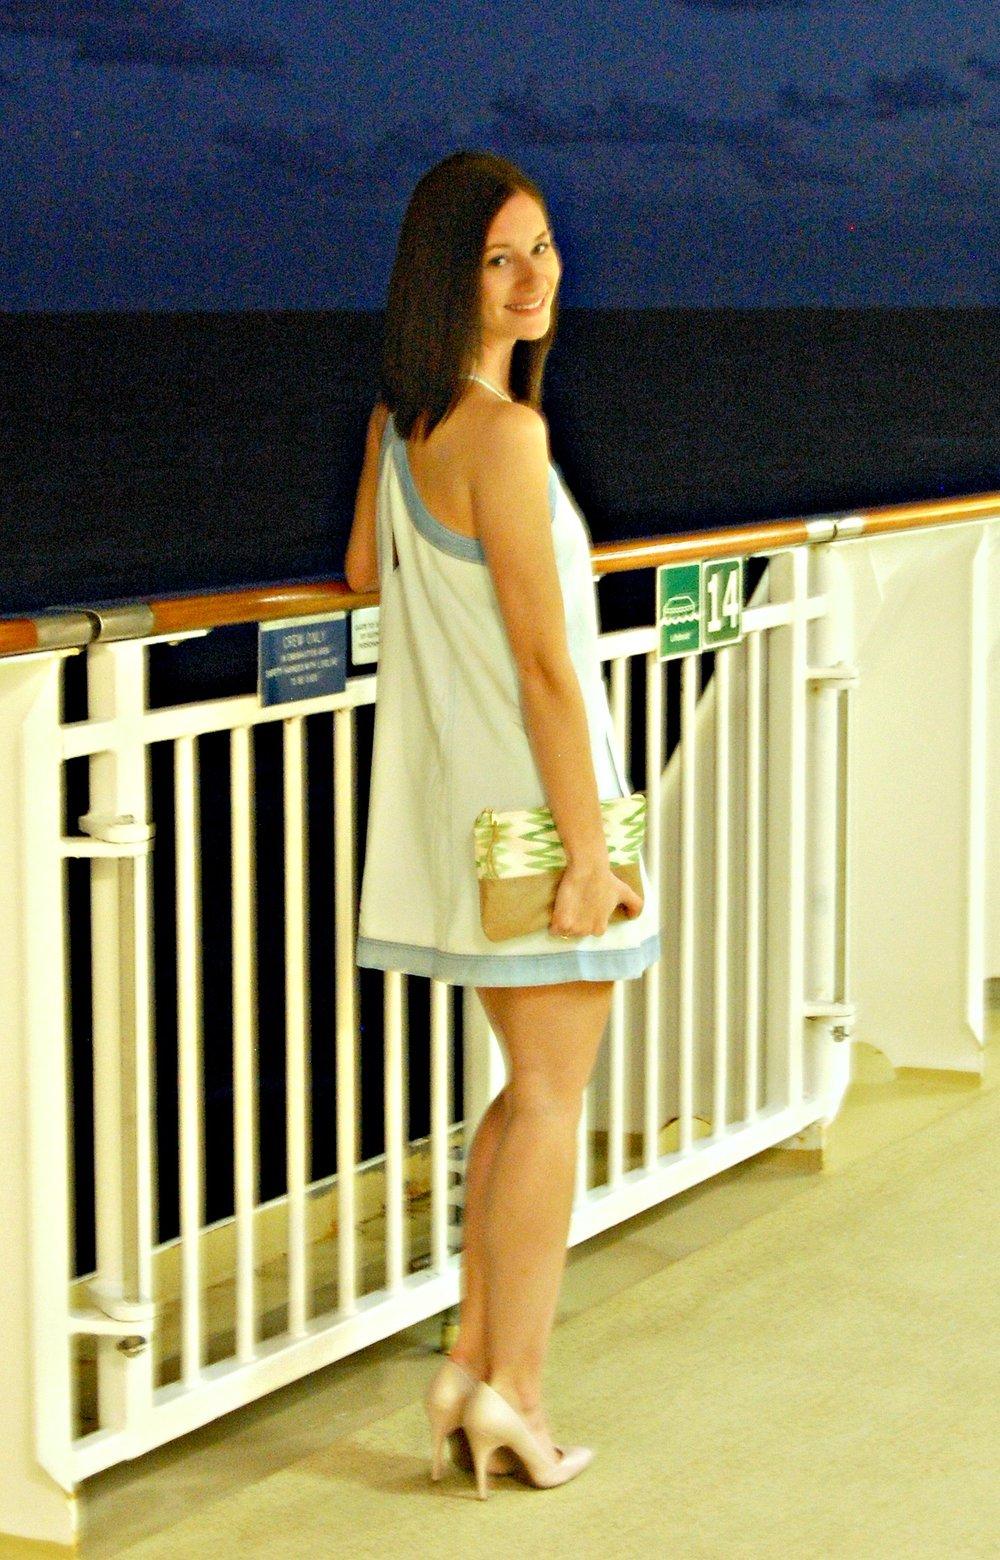 Evening | Katelyn Now